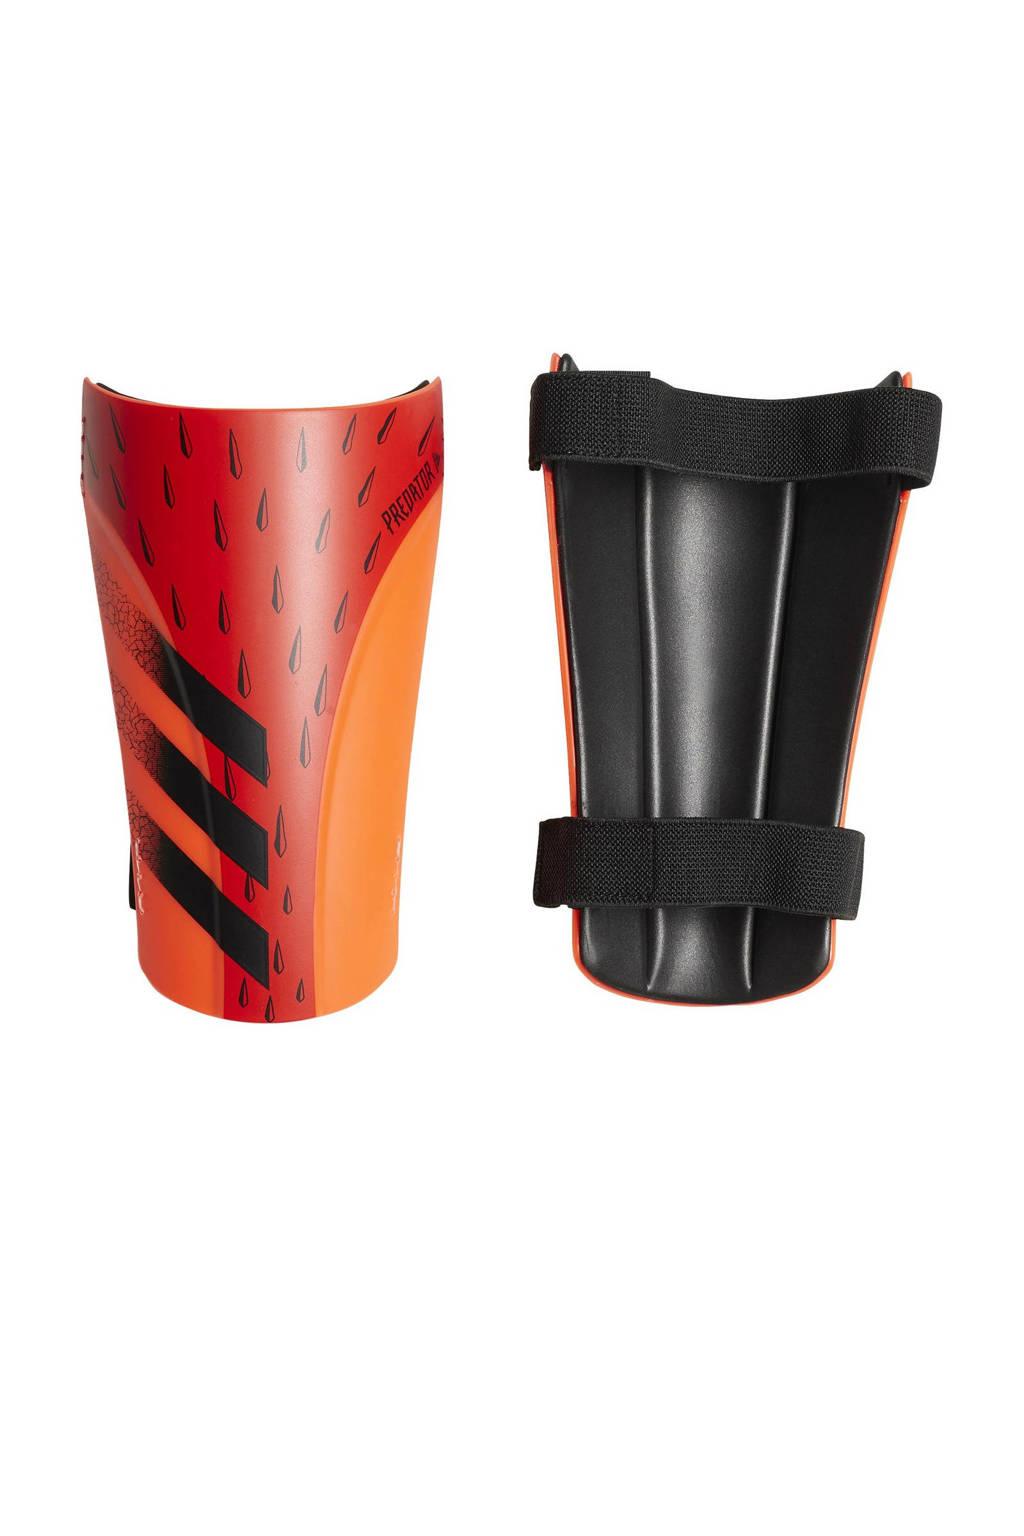 adidas Performance Senior  Predator scheenbeschermers oranje/zwart/rood, rood/zwart/rood